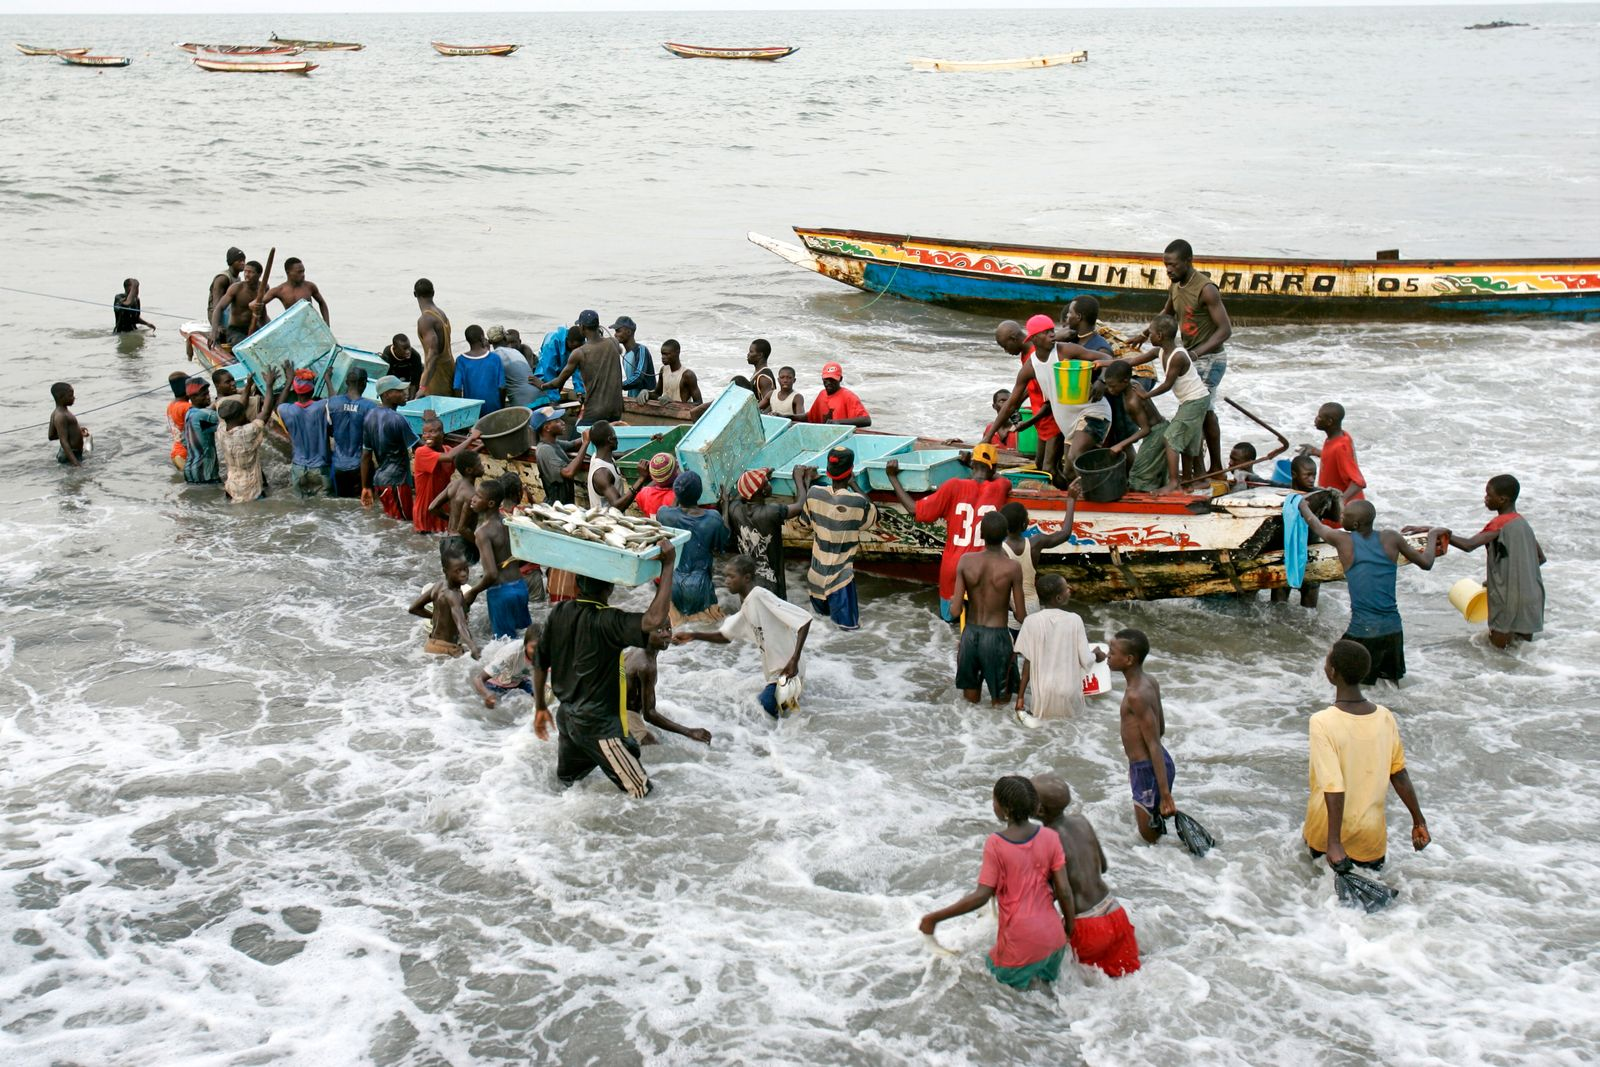 Young men wade in surf unloading fishing boat Bakau The Gambia CopyrightxAndrewxJxWoodley 4044_19_catch03_r8q1788